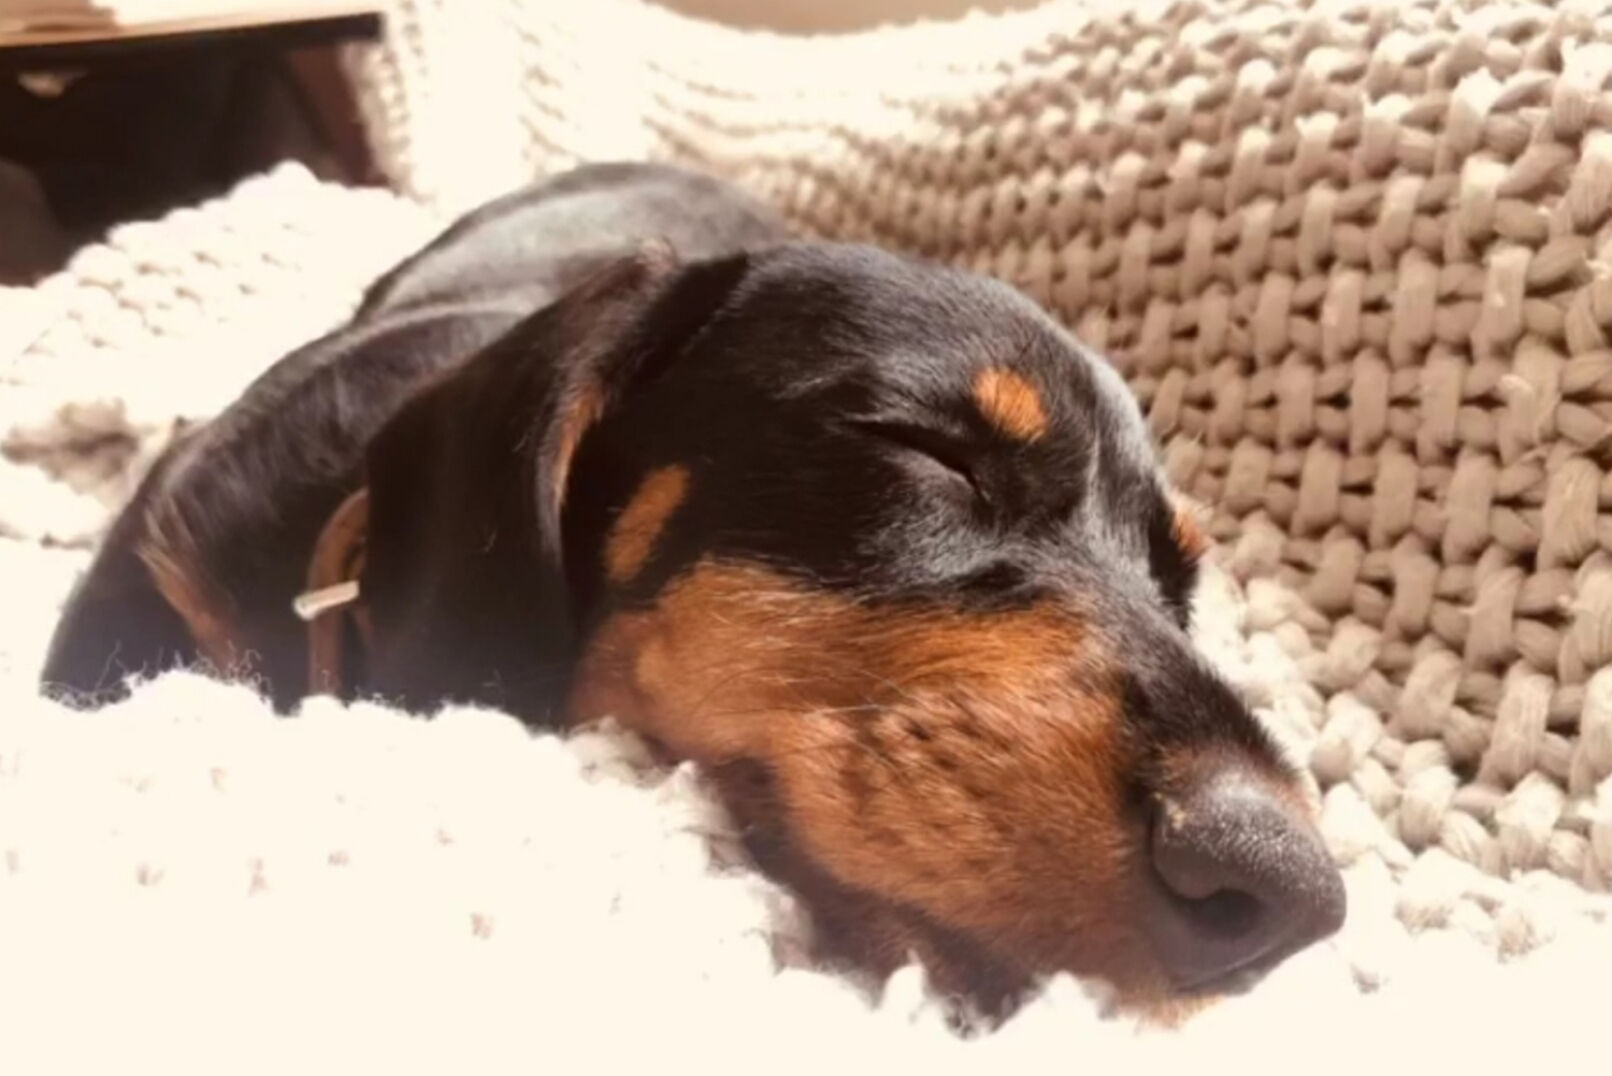 dachshund_agathe_pauer_ - © dachshund_agathe_pauer_